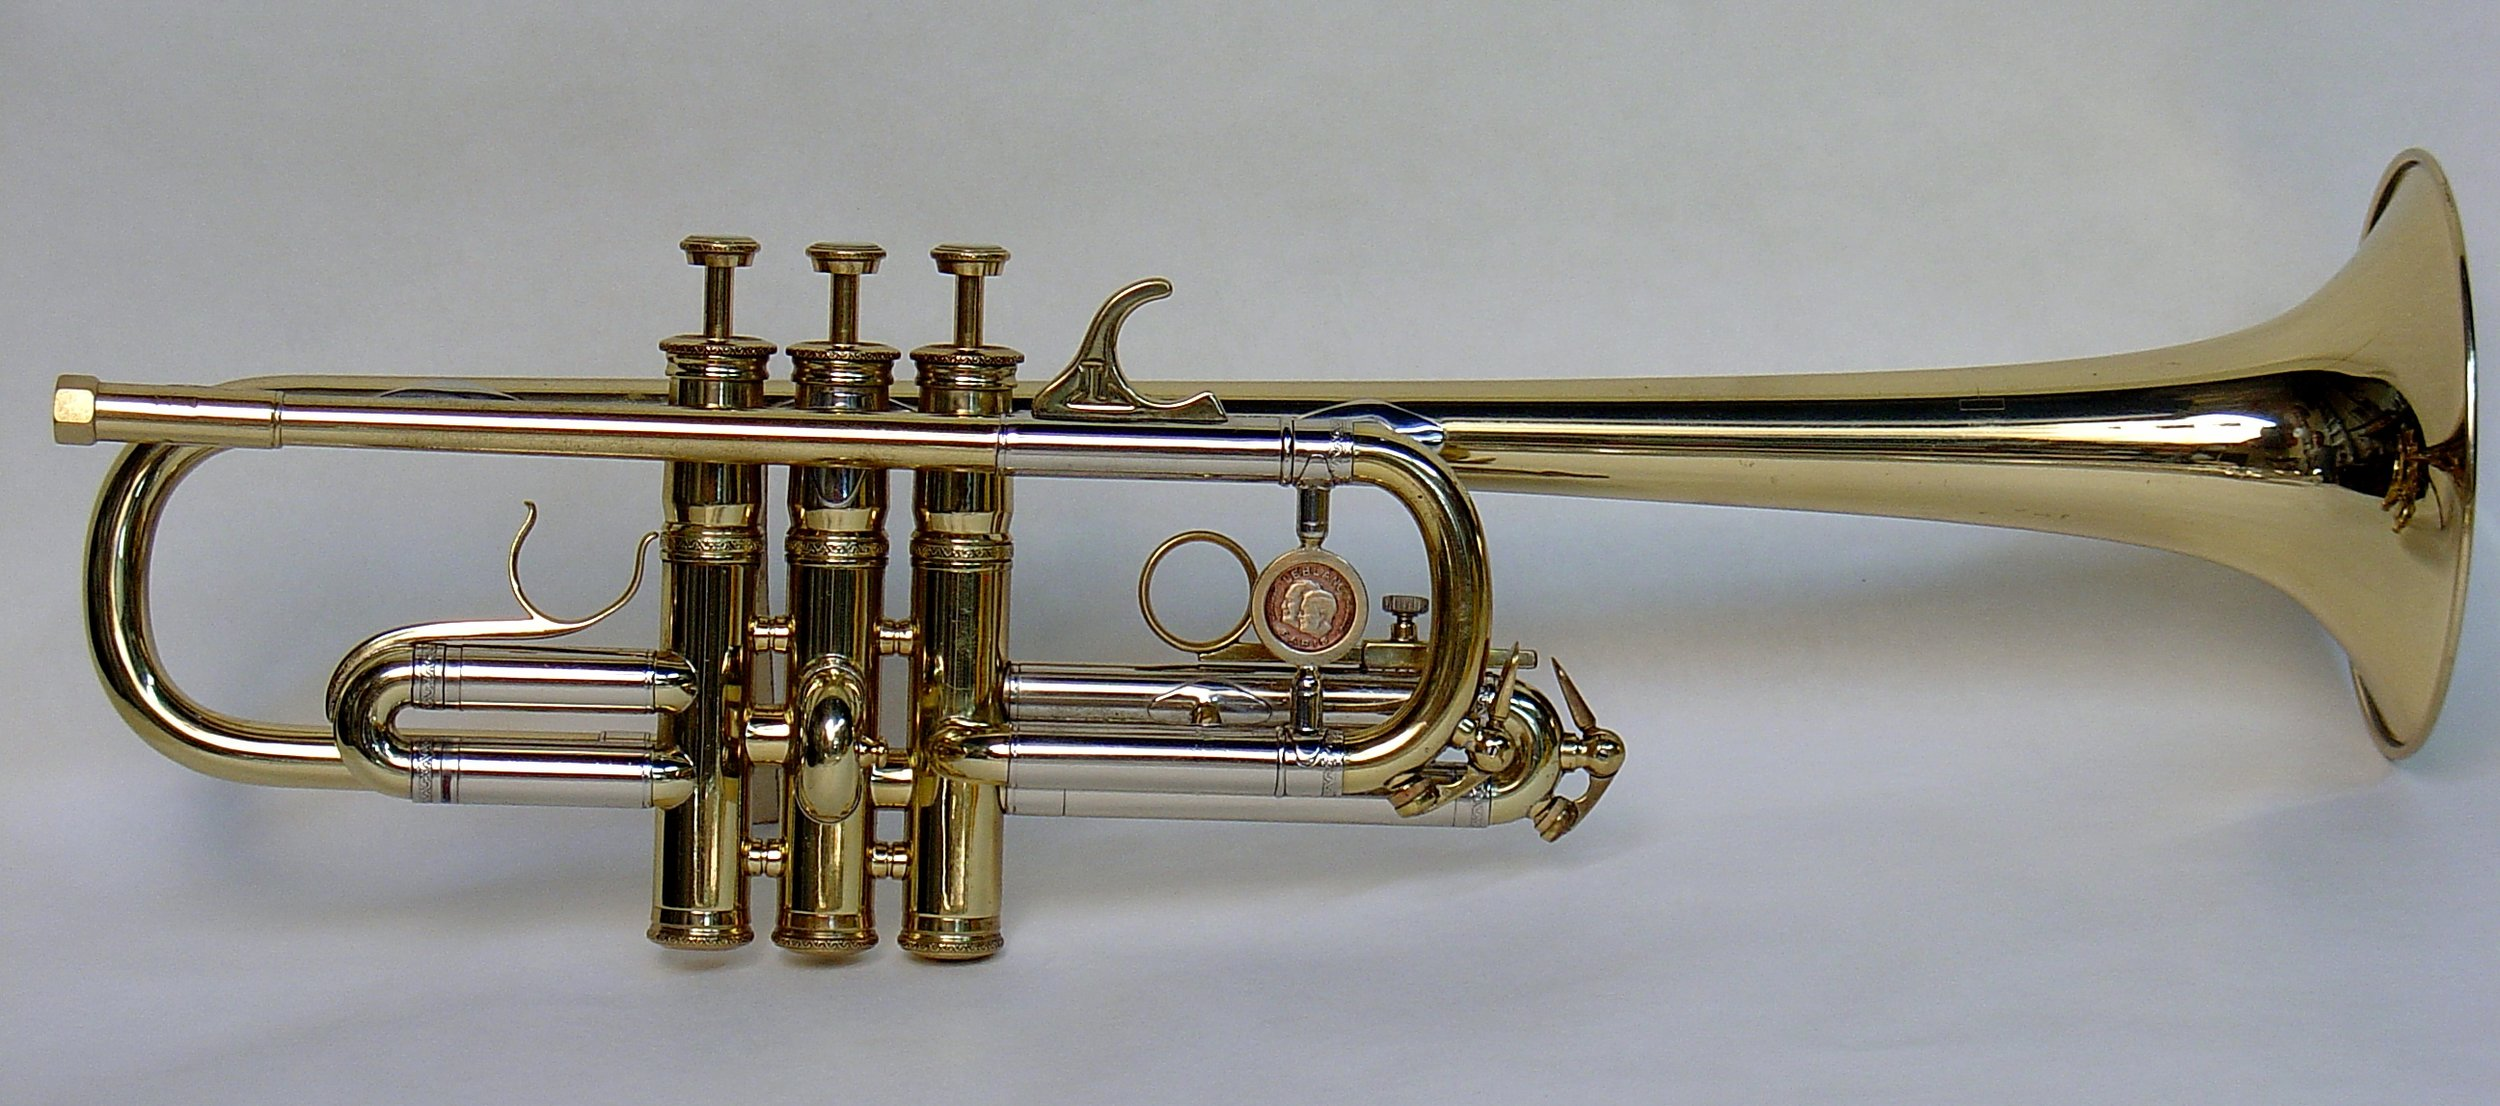 Jimmy Rowles Holton/Leblanc C Trumpet